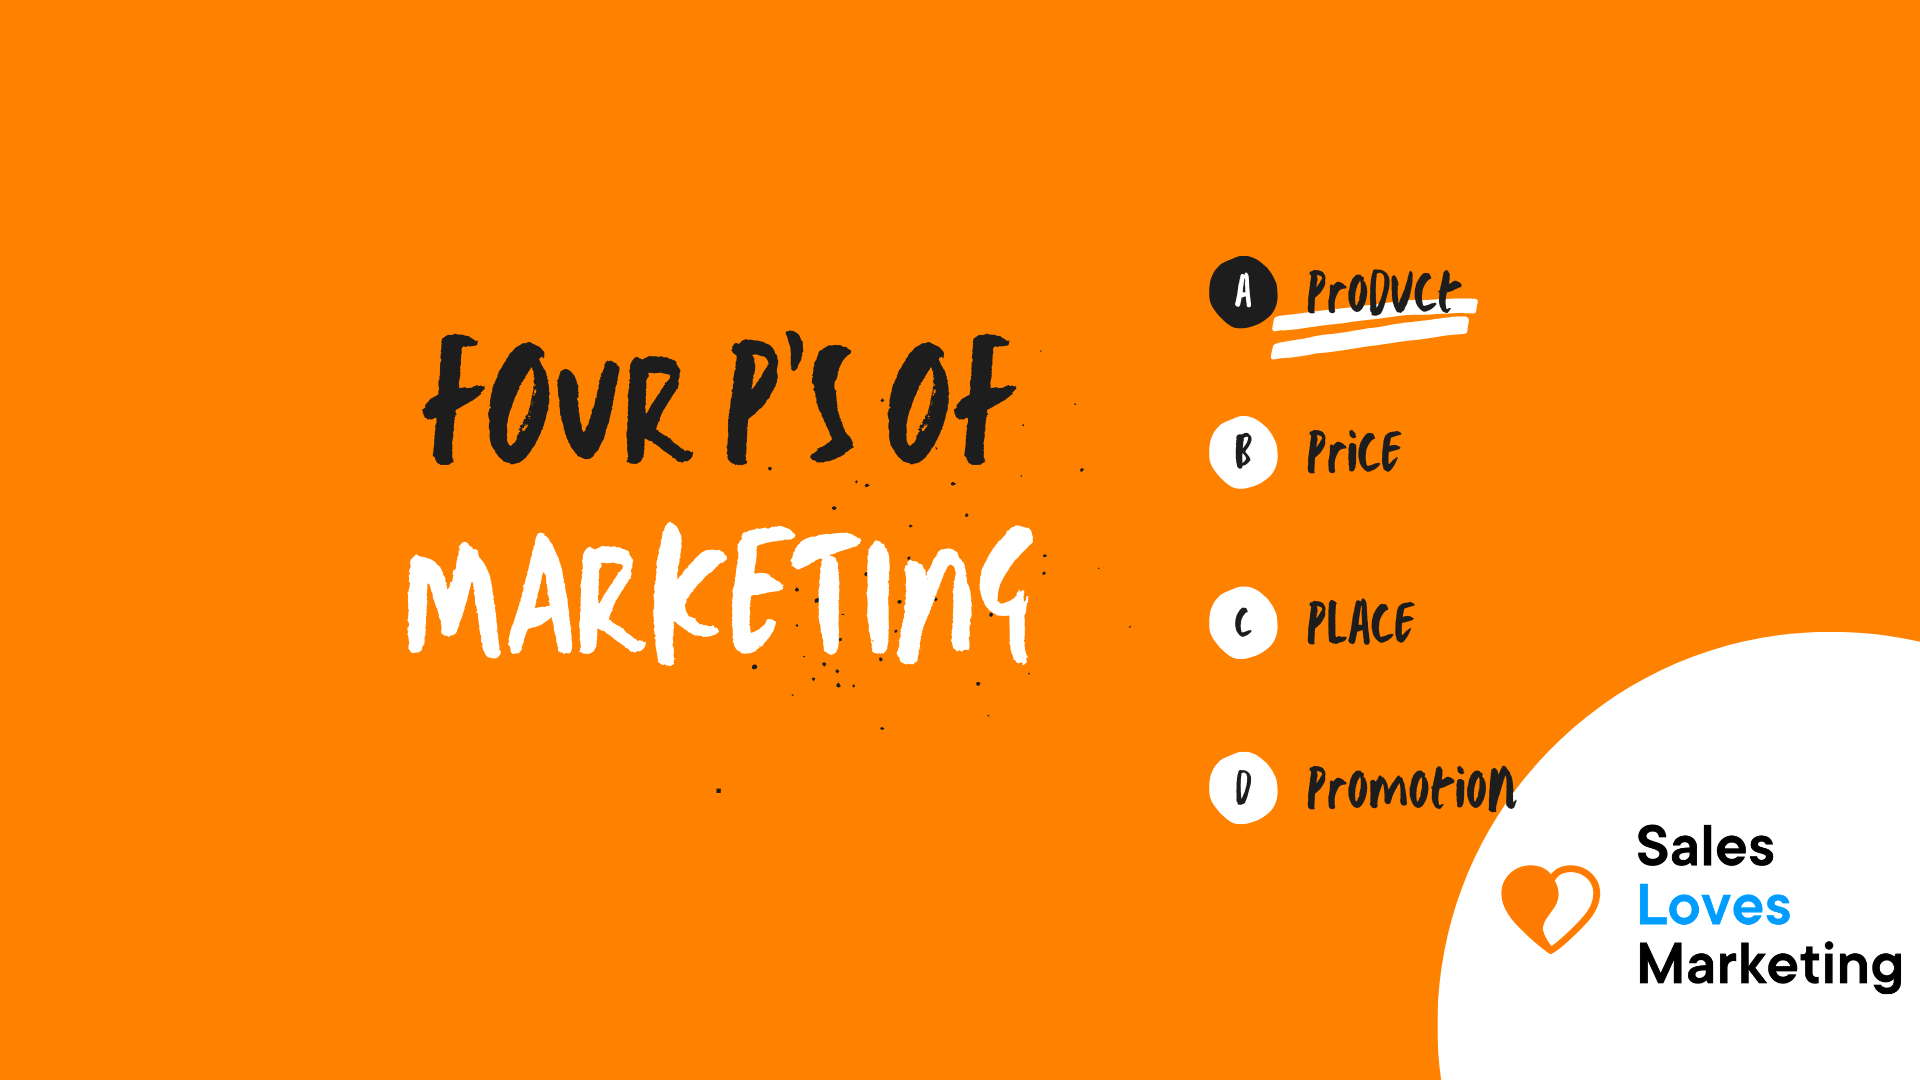 Four P's of marketing